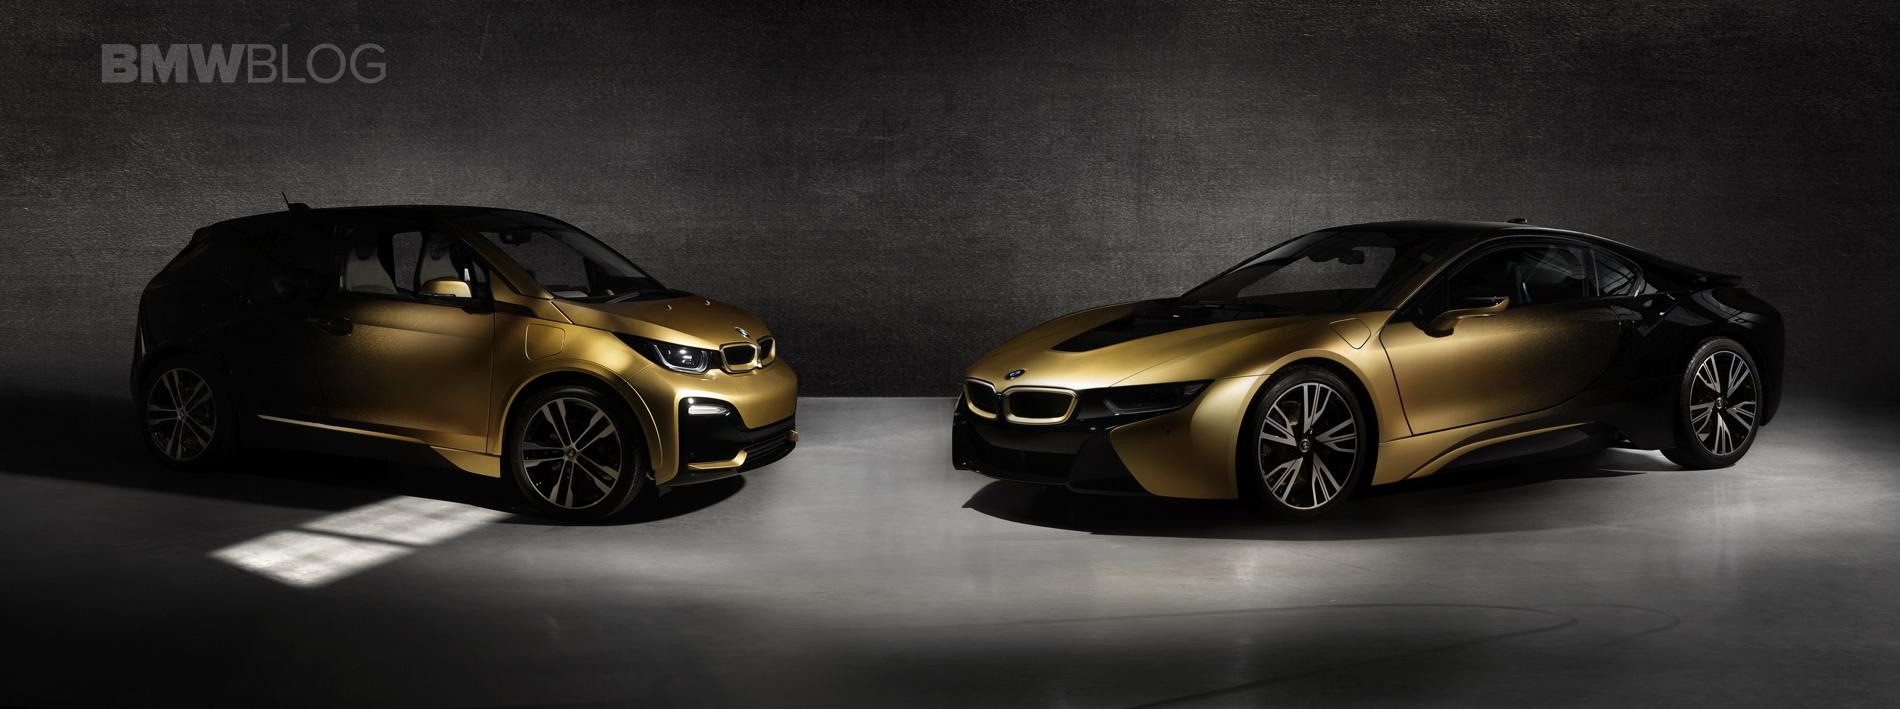 BMW i3 and i8 Starlight Edition 01